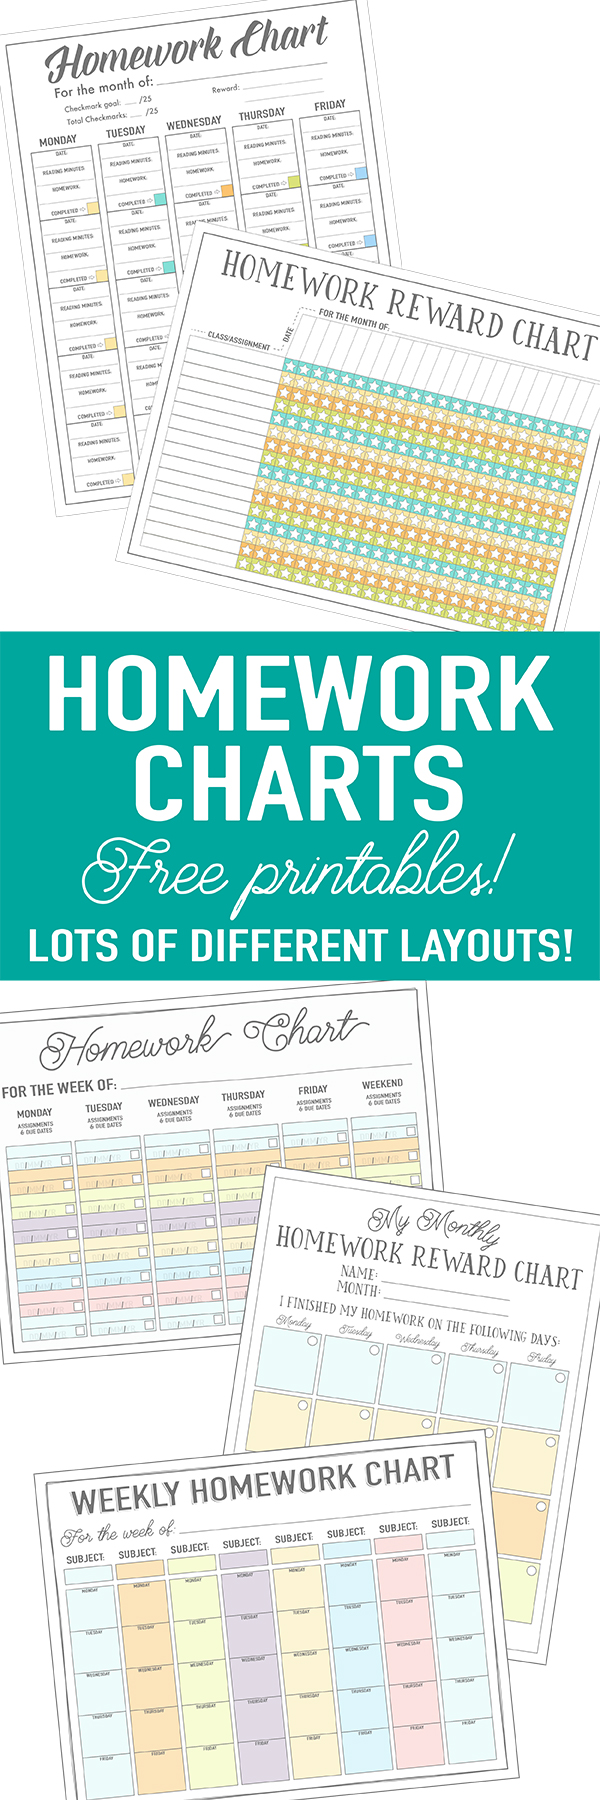 free printable homework charts for kids